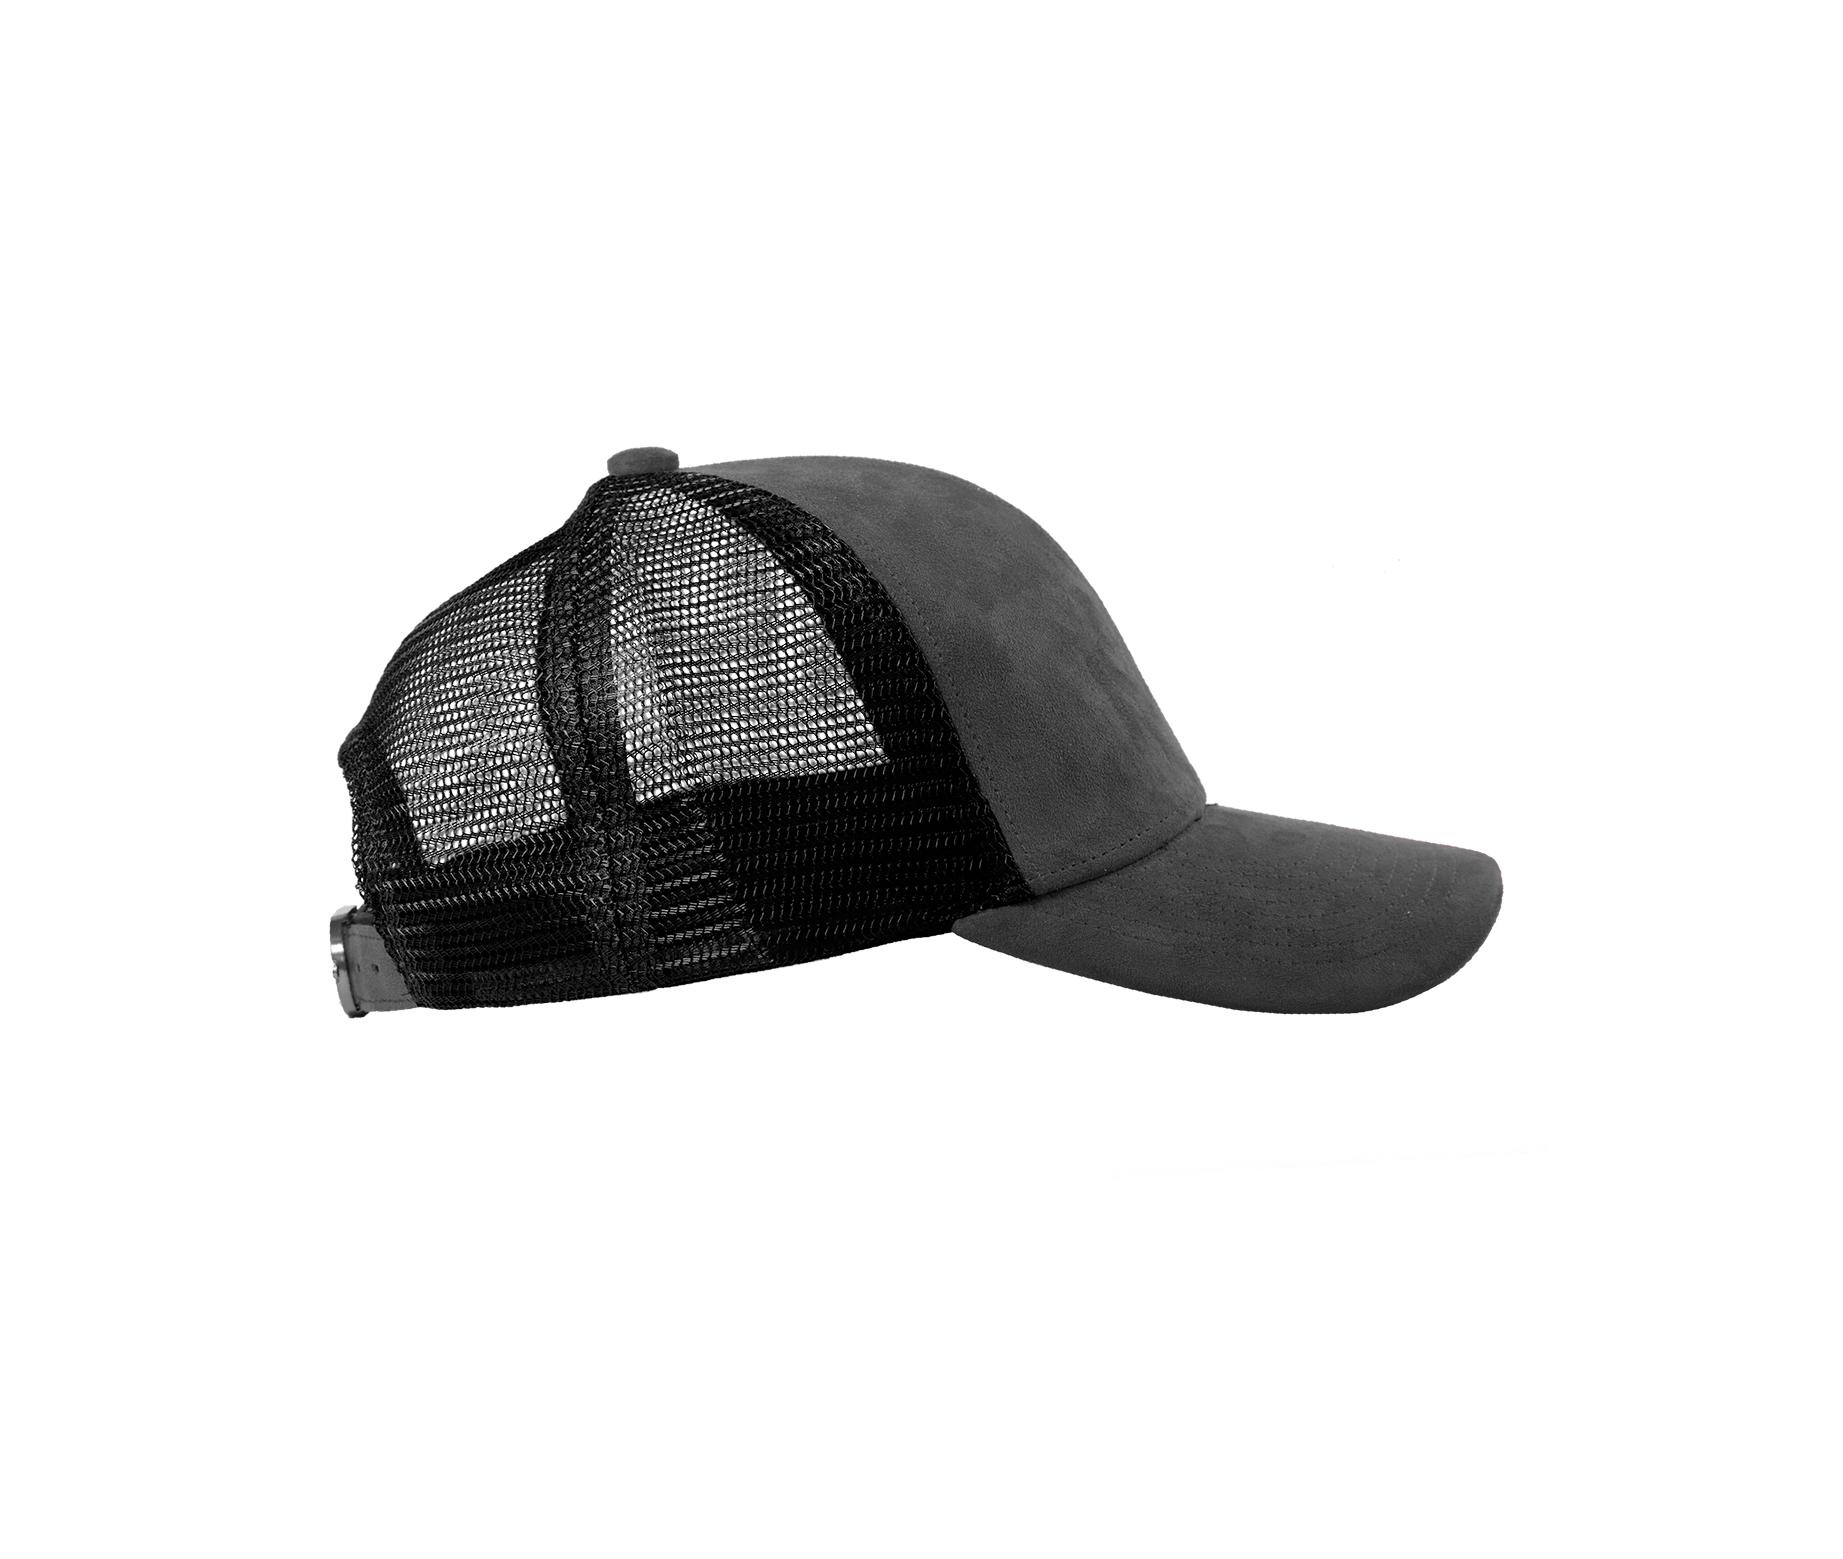 TRUCKER CAP ANTHRACITE SUEDE SIDE